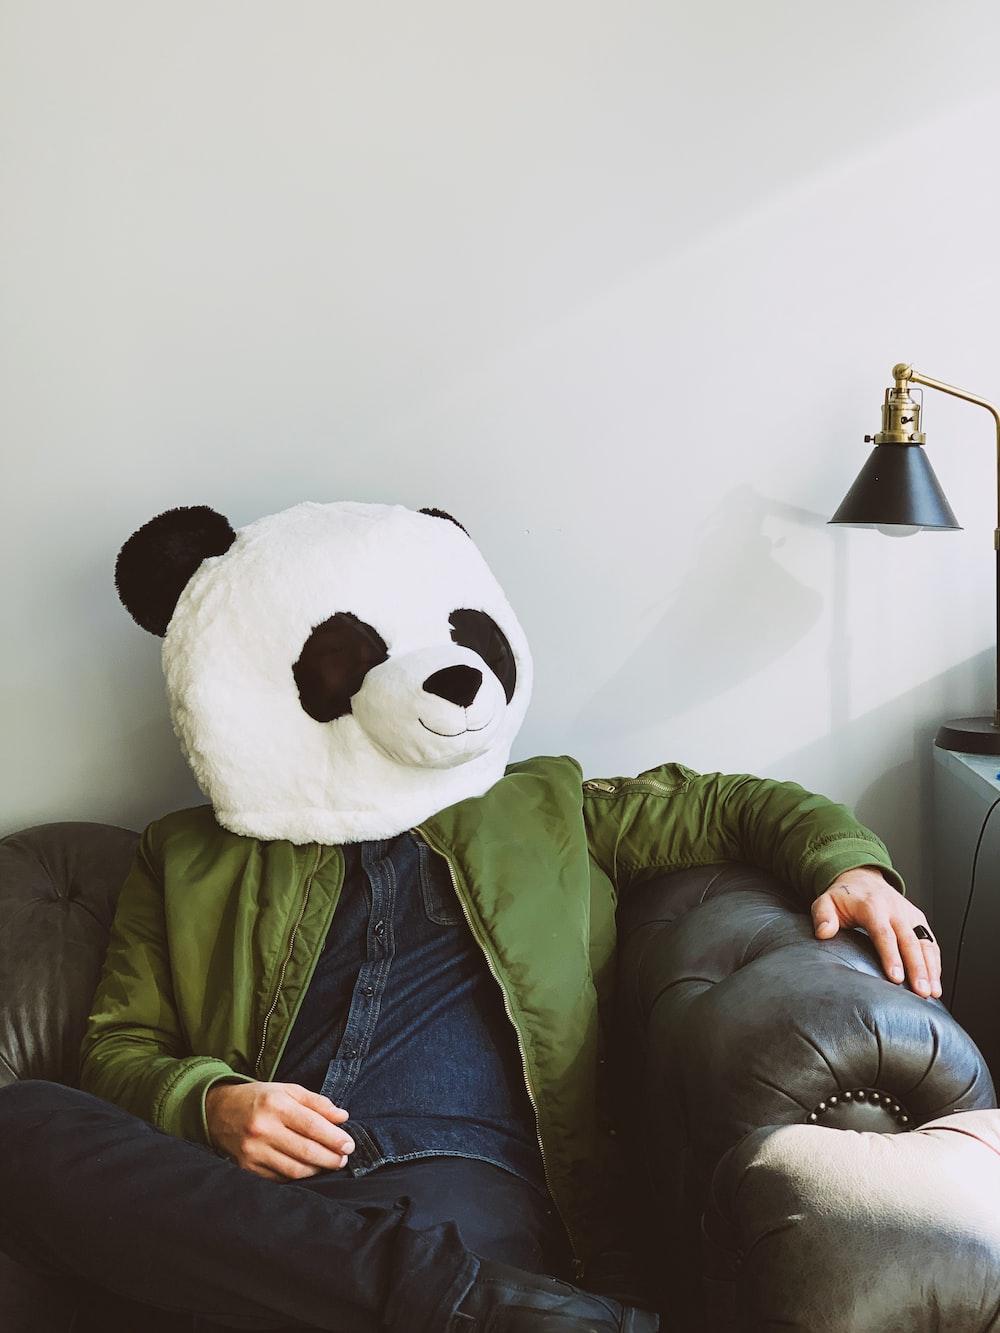 person wearing panda costume head